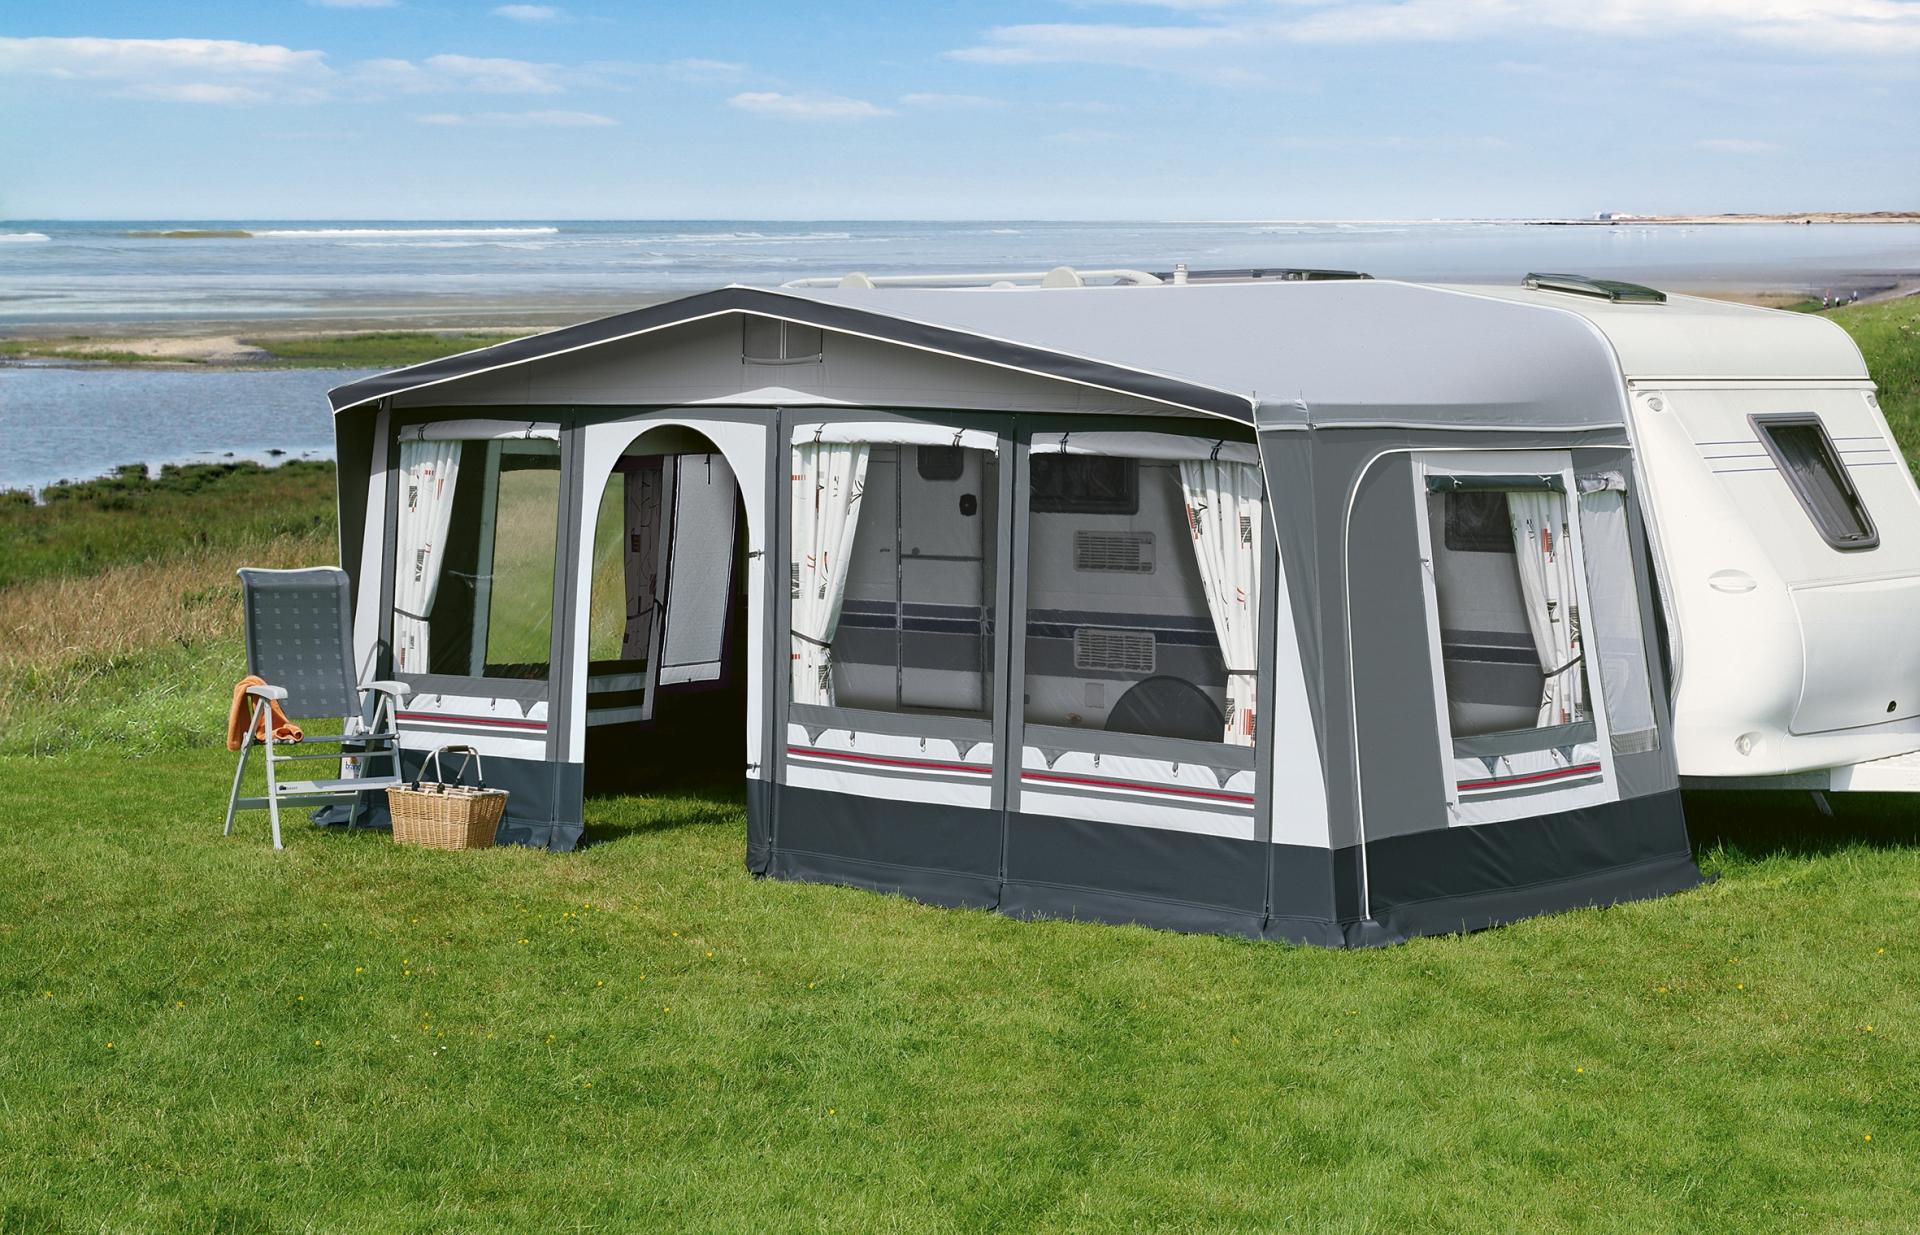 brand riogrande 280 wohnwagen vorzelt gr e 13 umlaufma. Black Bedroom Furniture Sets. Home Design Ideas